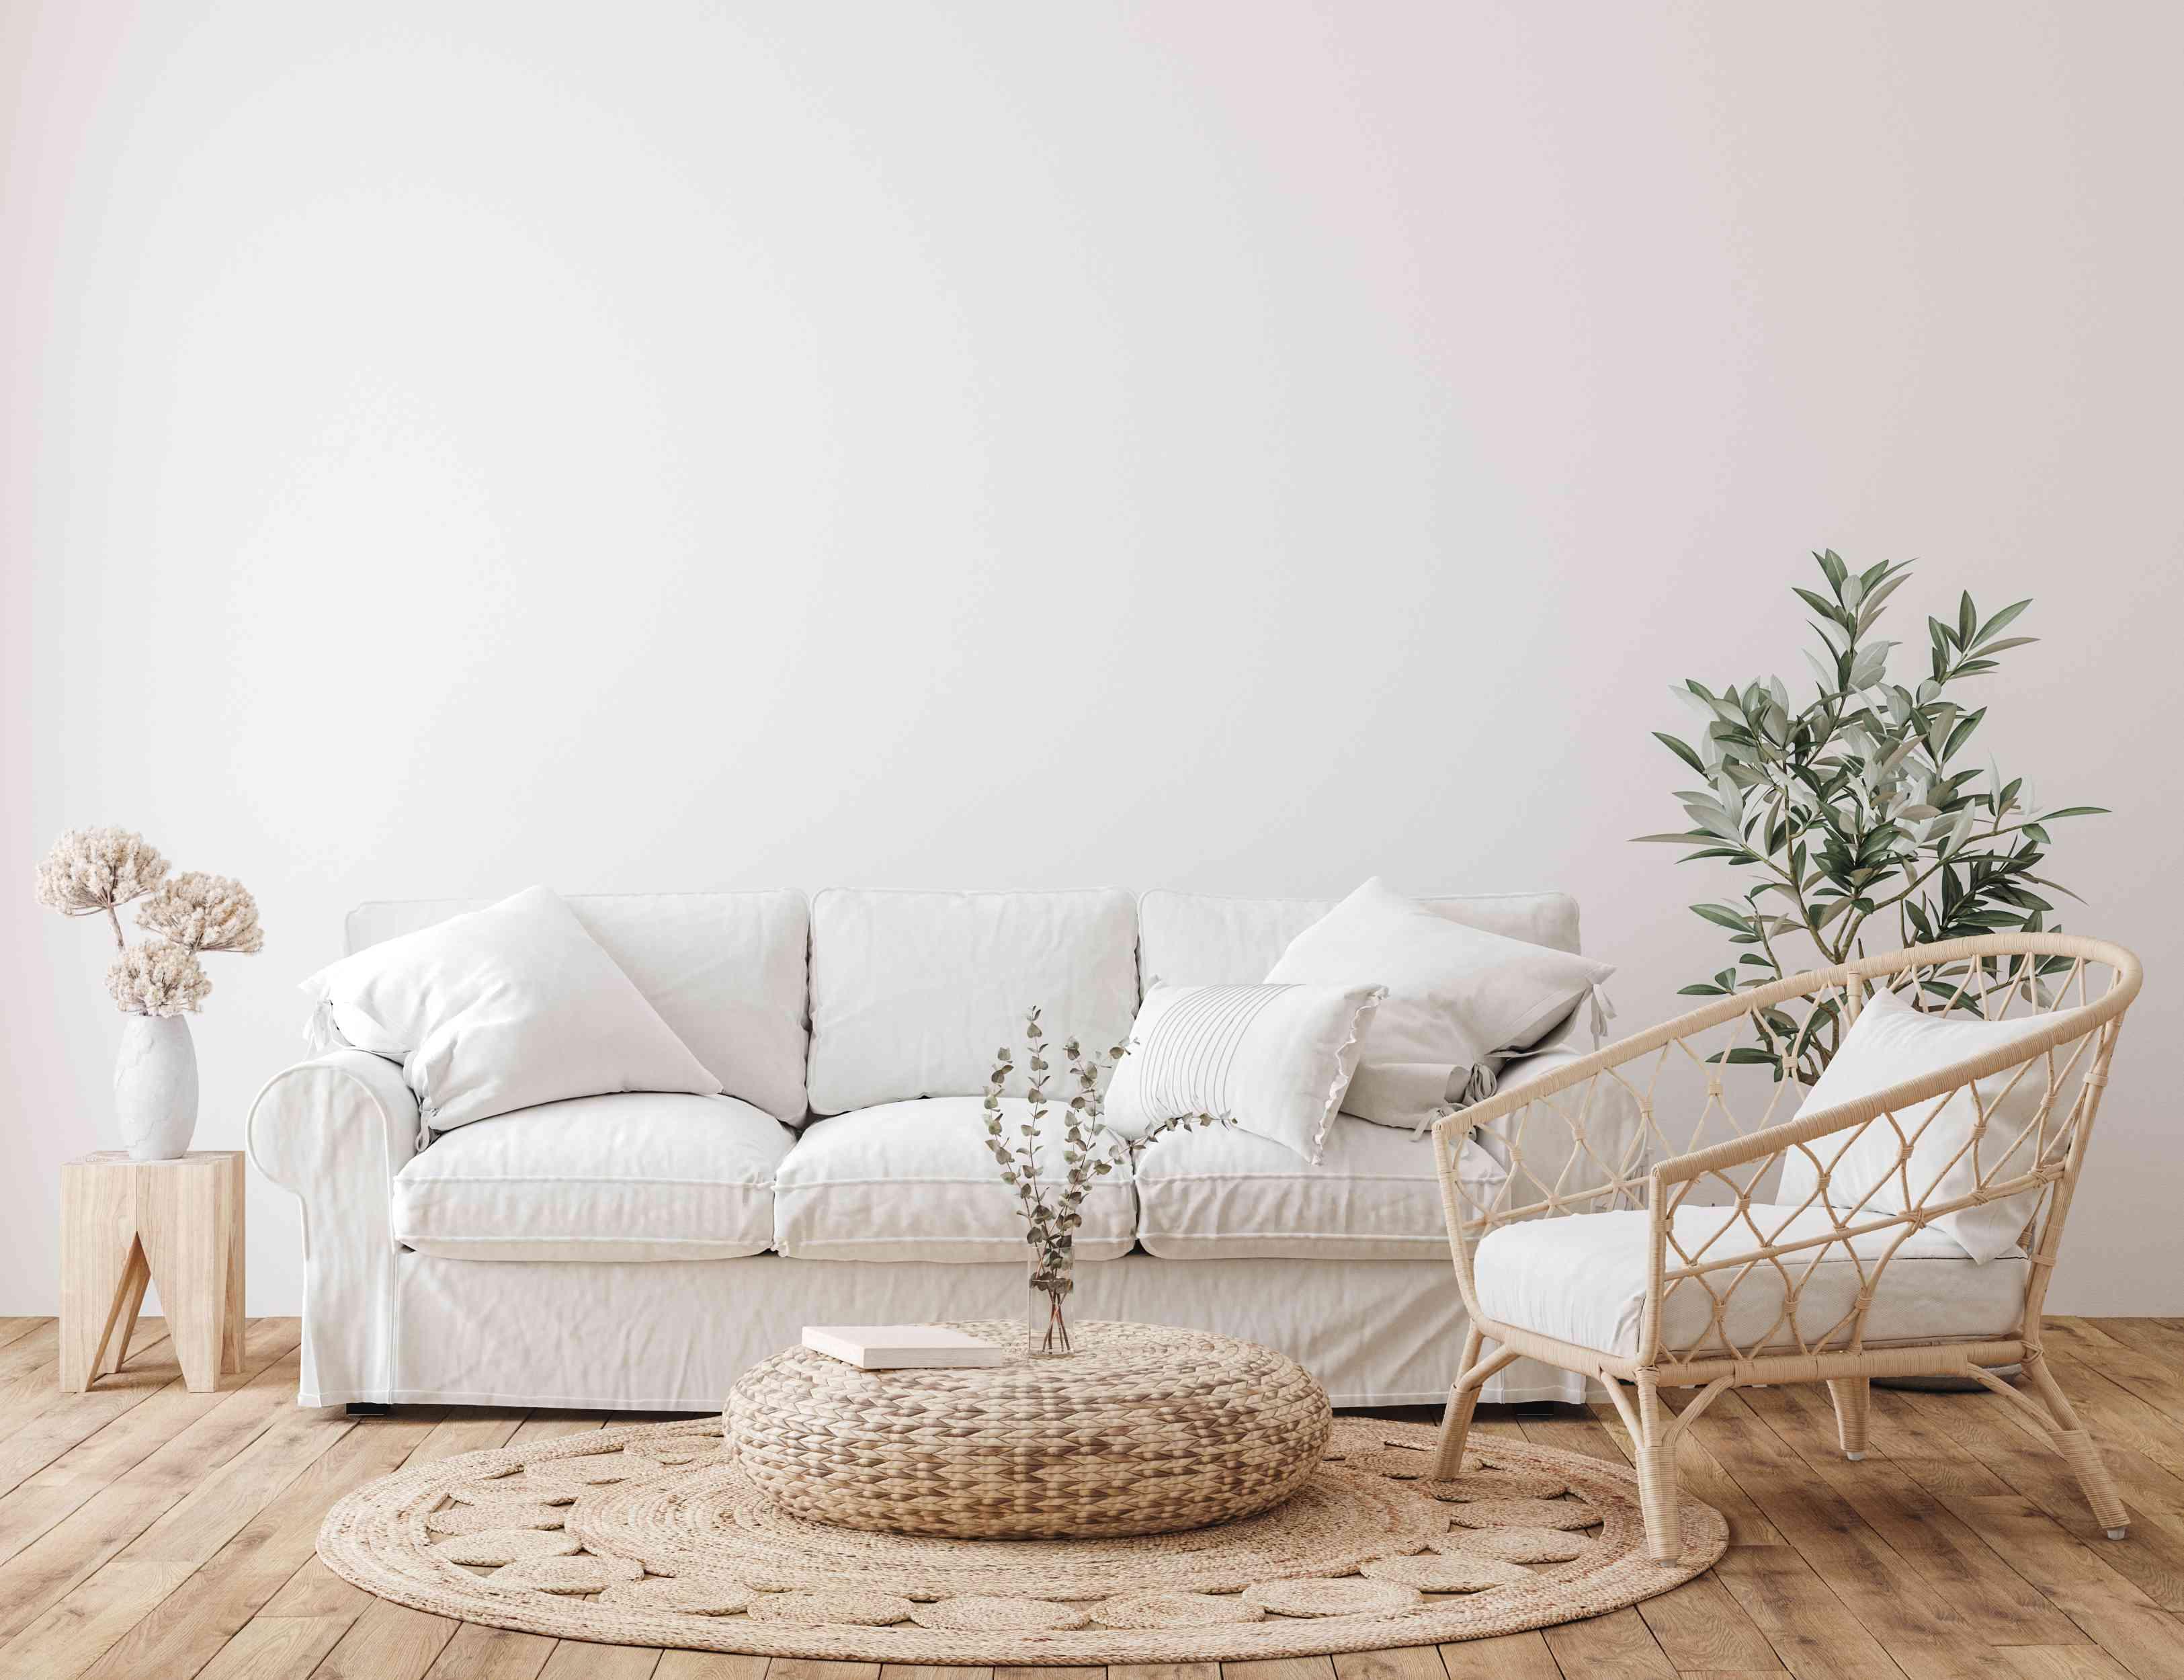 A white sofa in a farmhouse-style living room